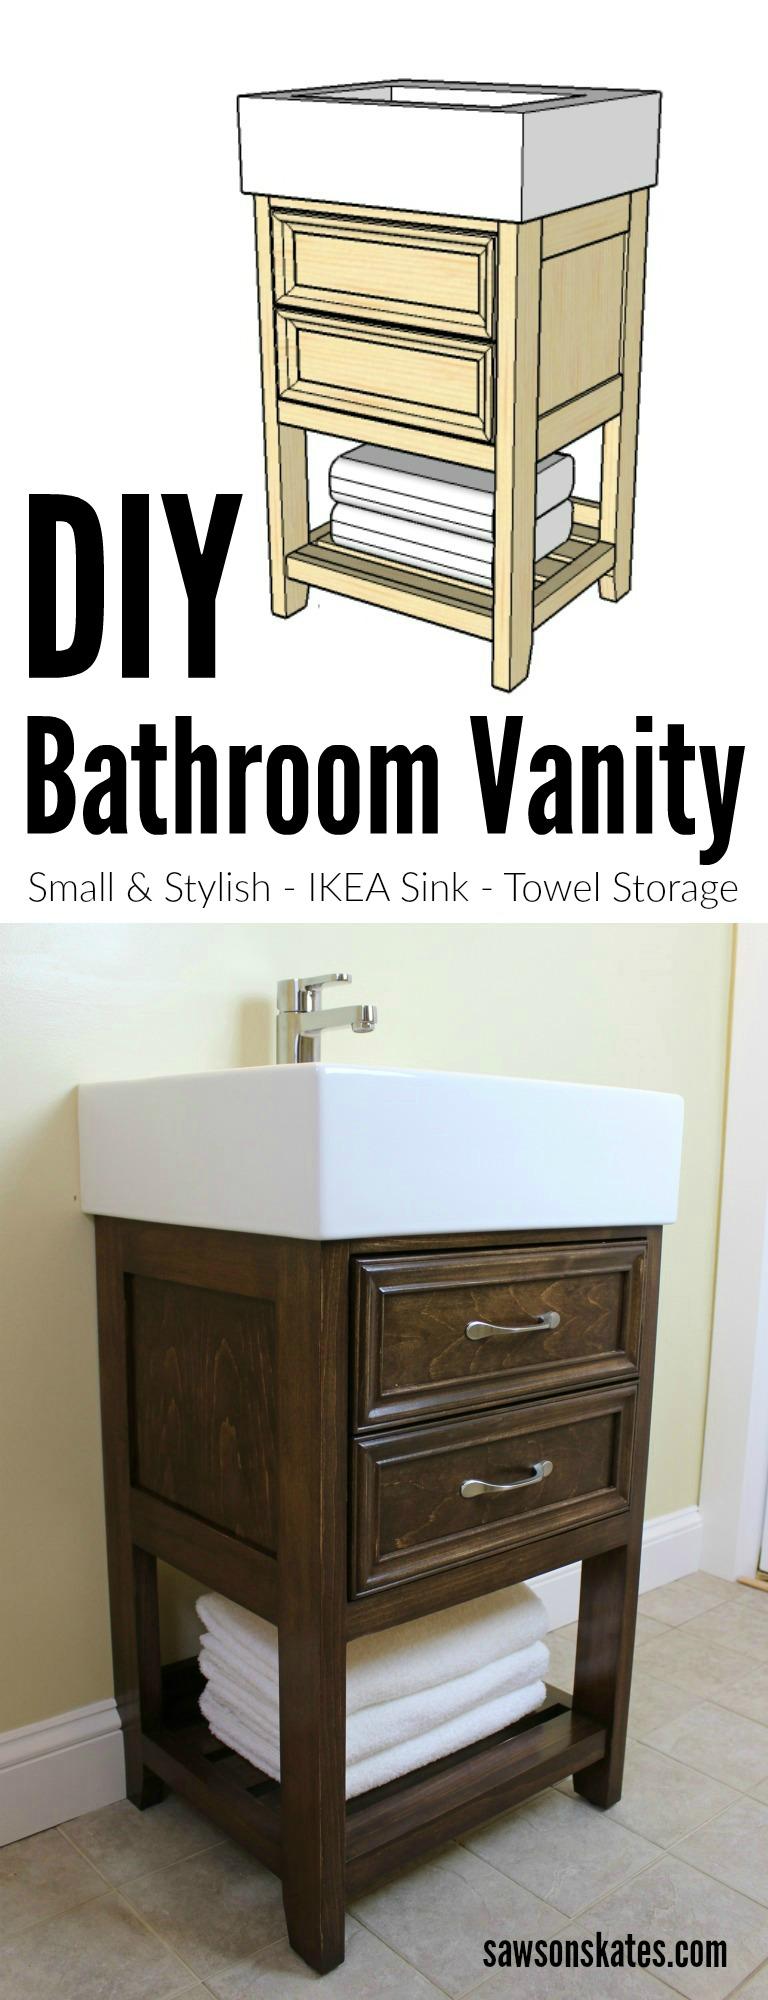 Saws on Skates & Small Size Big Style DIY Bathroom Vanity